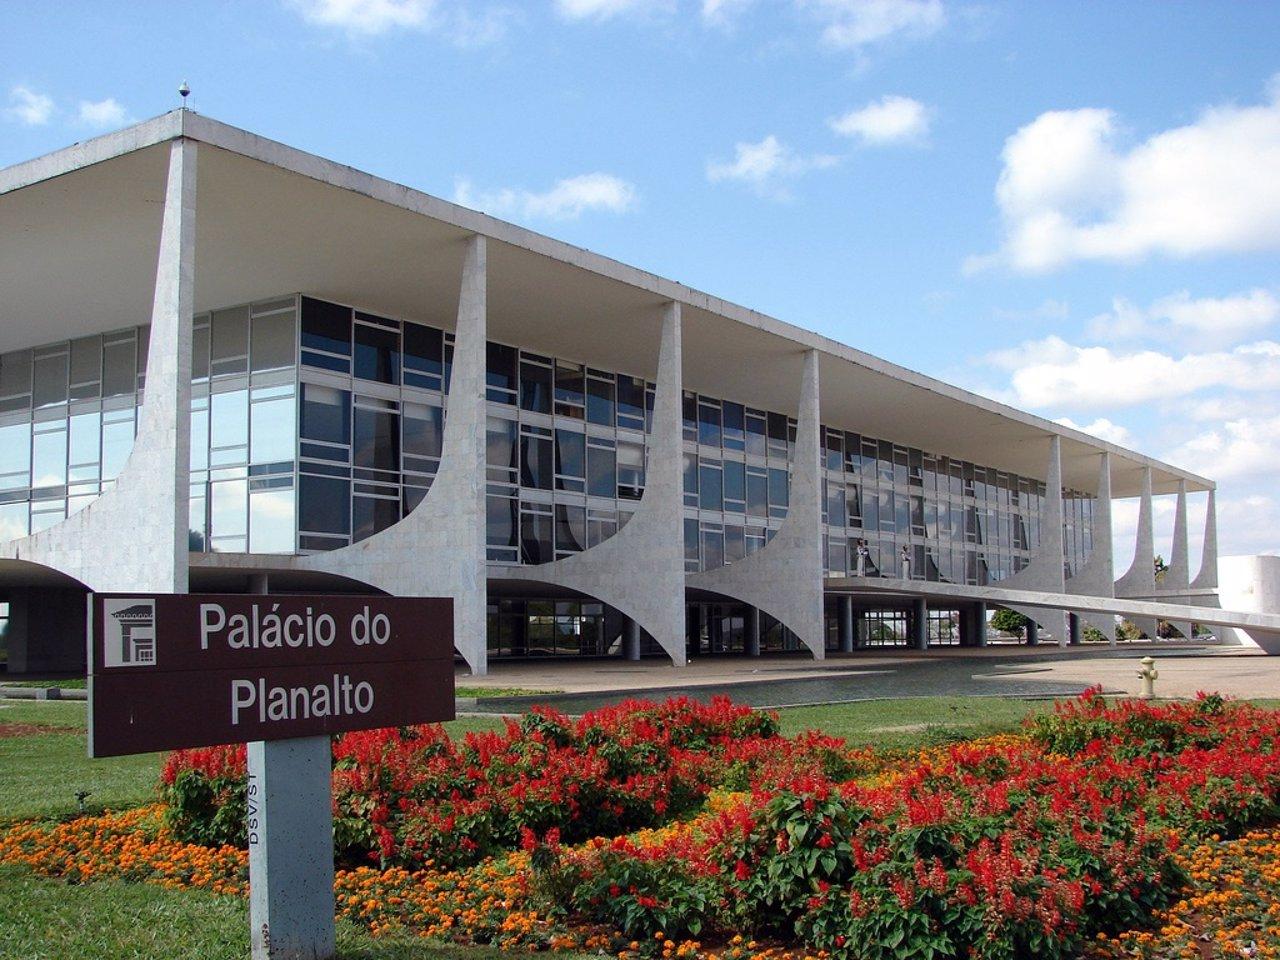 Palacio de Planalto en Brasil